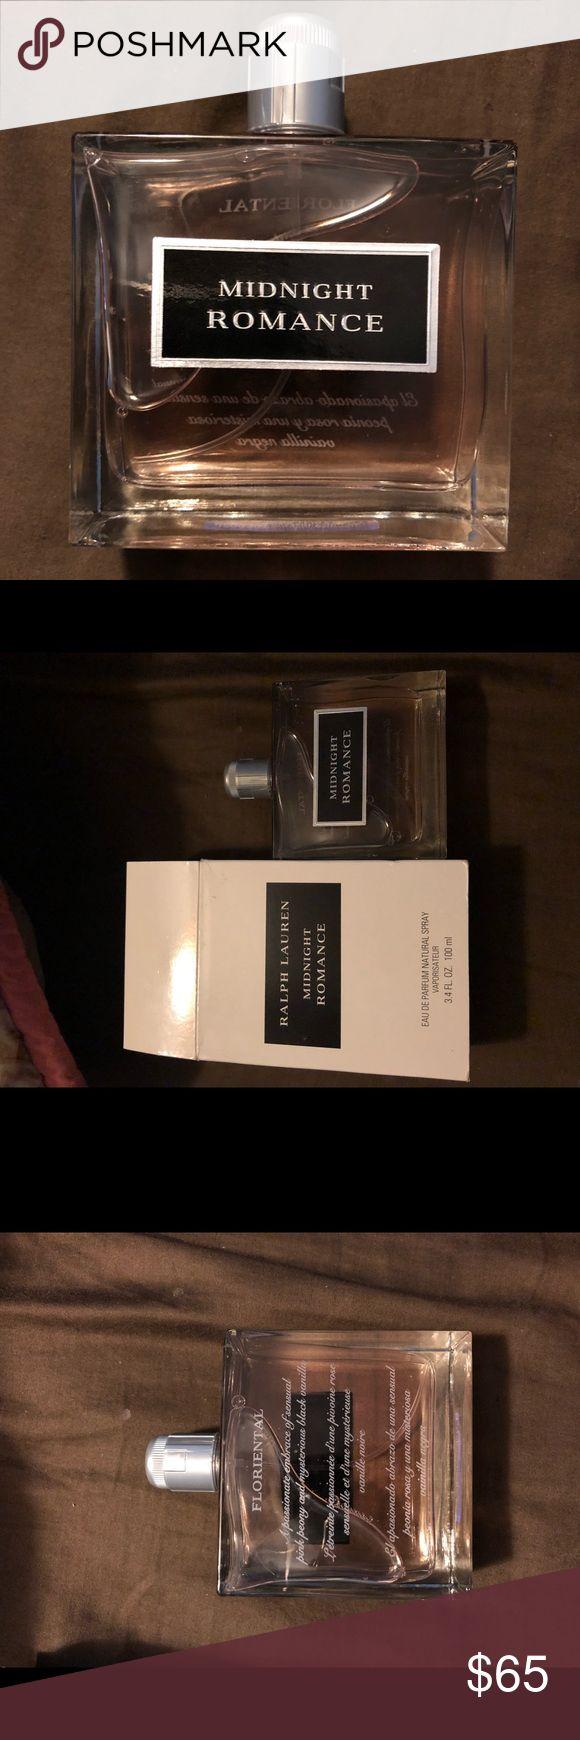 Ralph Lauren MIDNIGHT ROMANCE Eau de Parfum Authentic perfume, never used.  3.4 Fl ounces  Smells super good; pink peony and blank vanilla Ralph Lauren Other